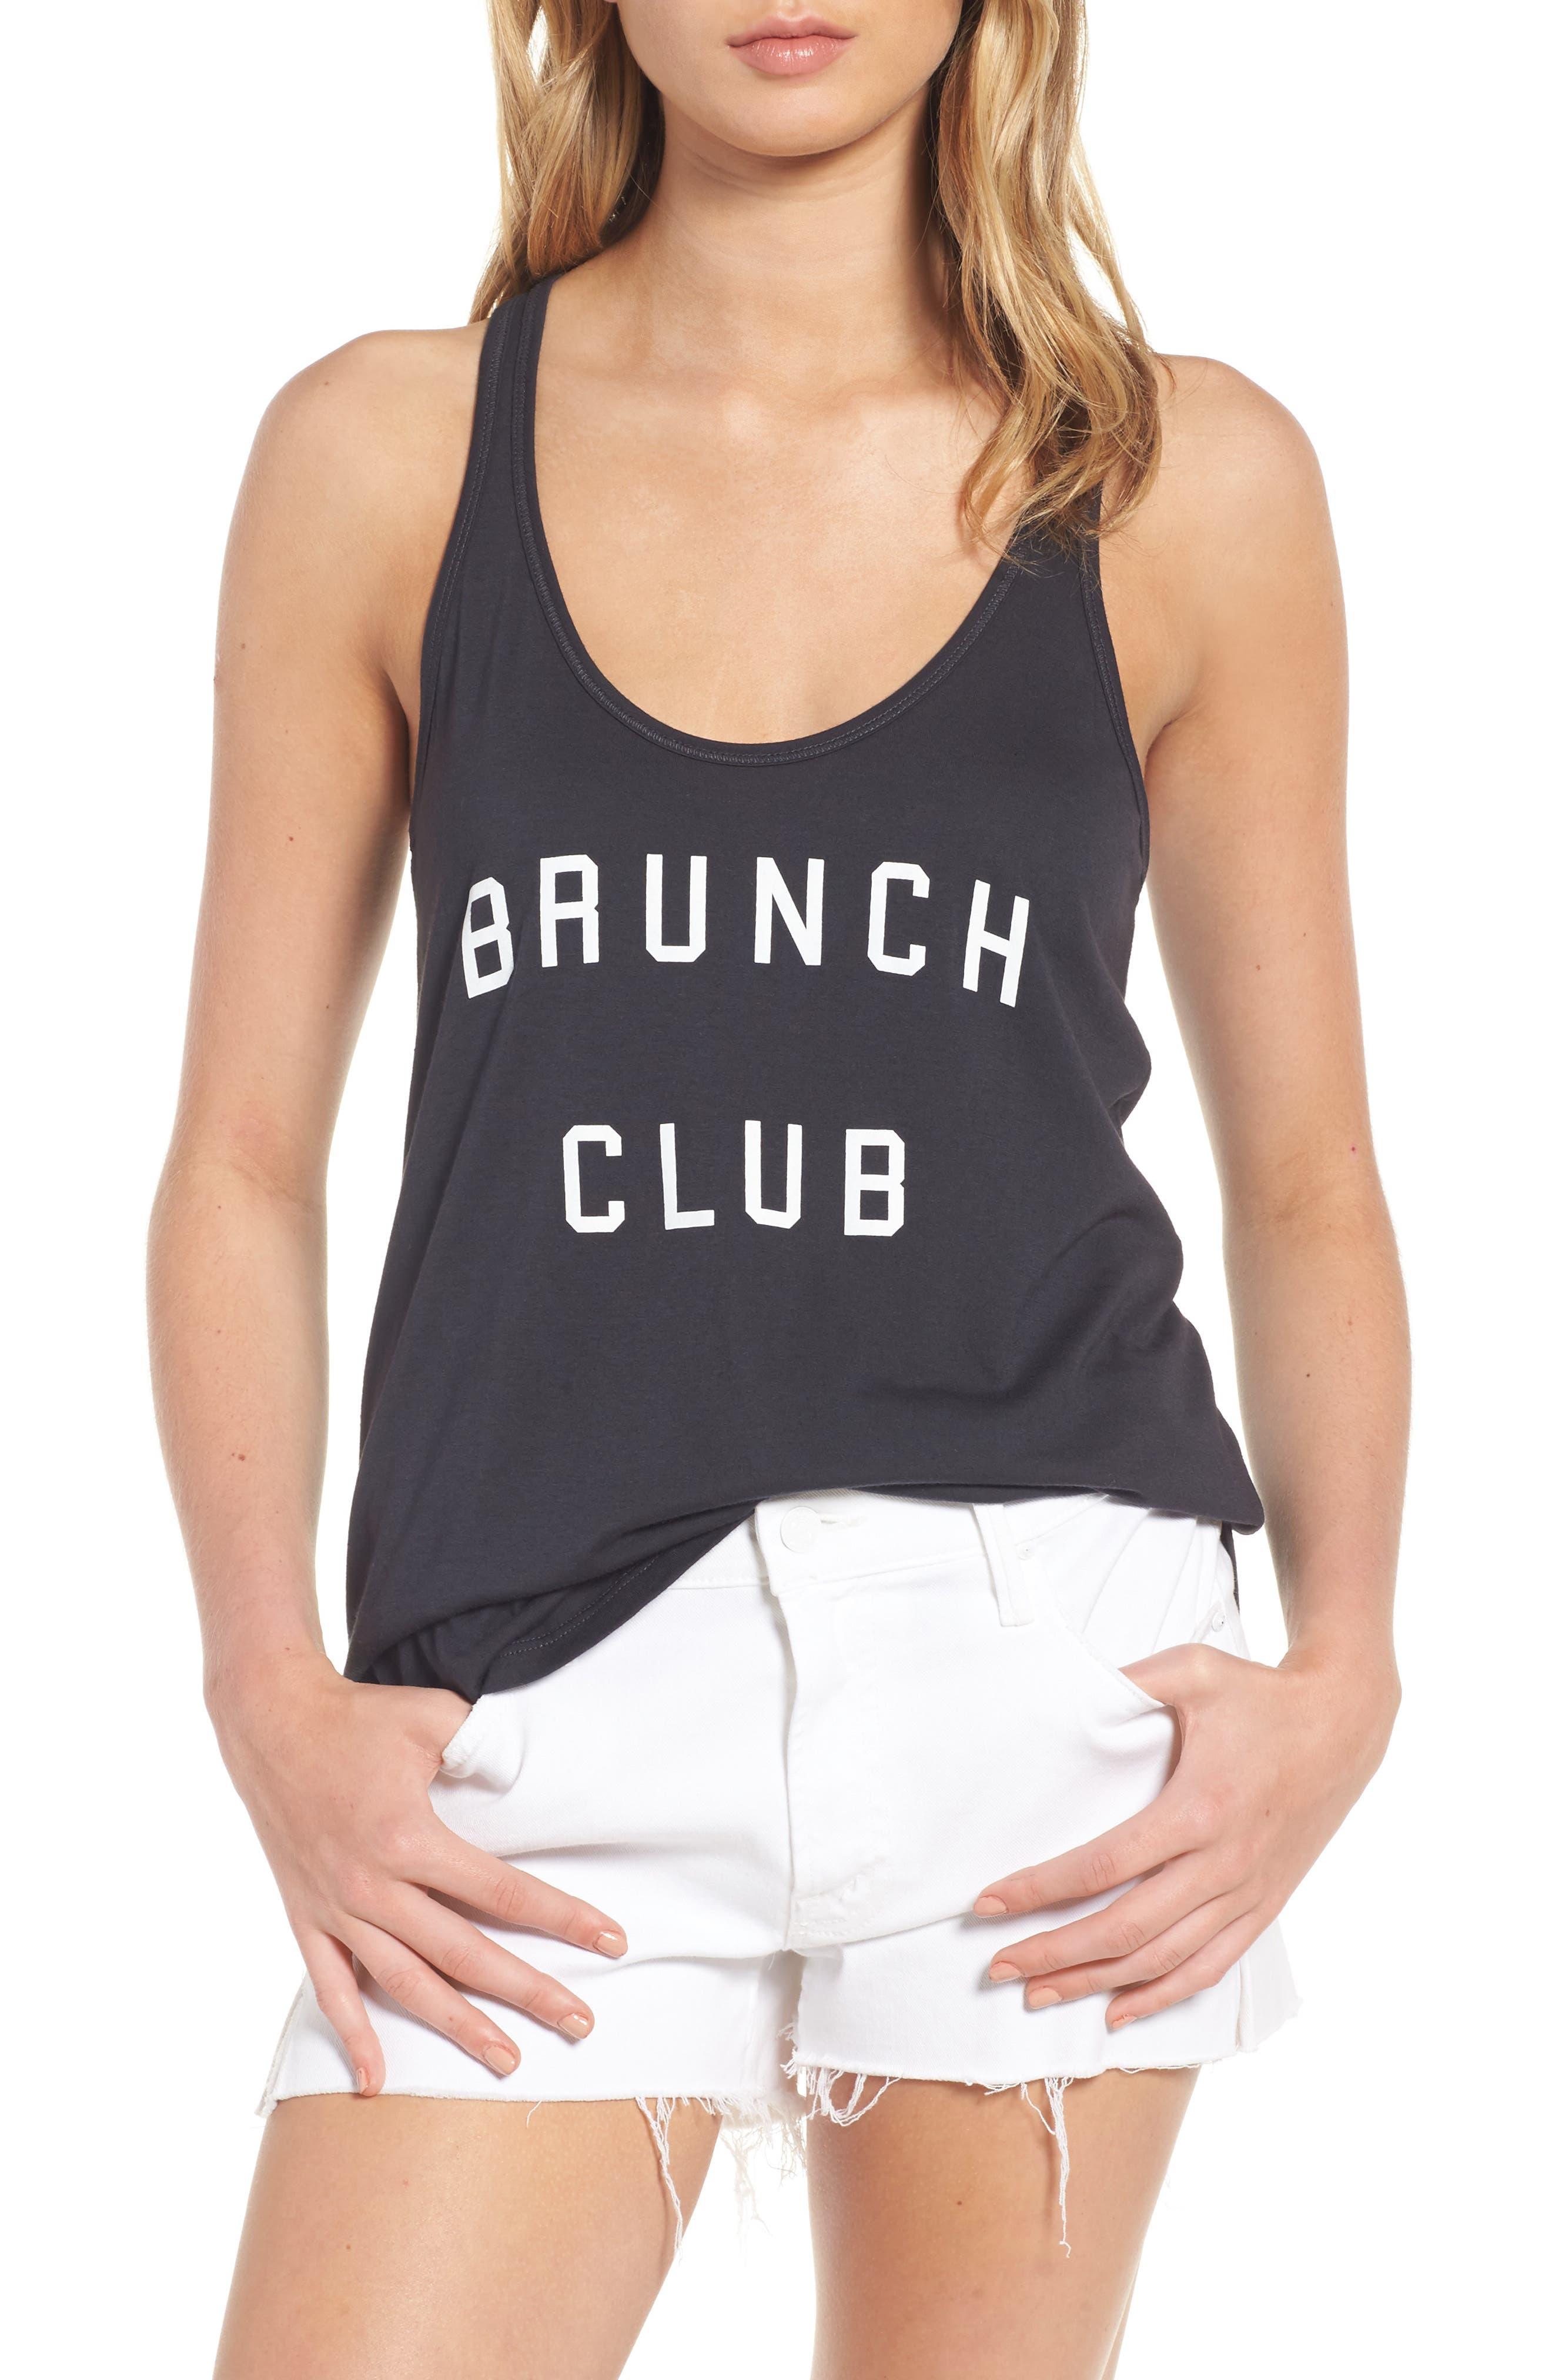 Brunch Club Tank,                         Main,                         color, Black